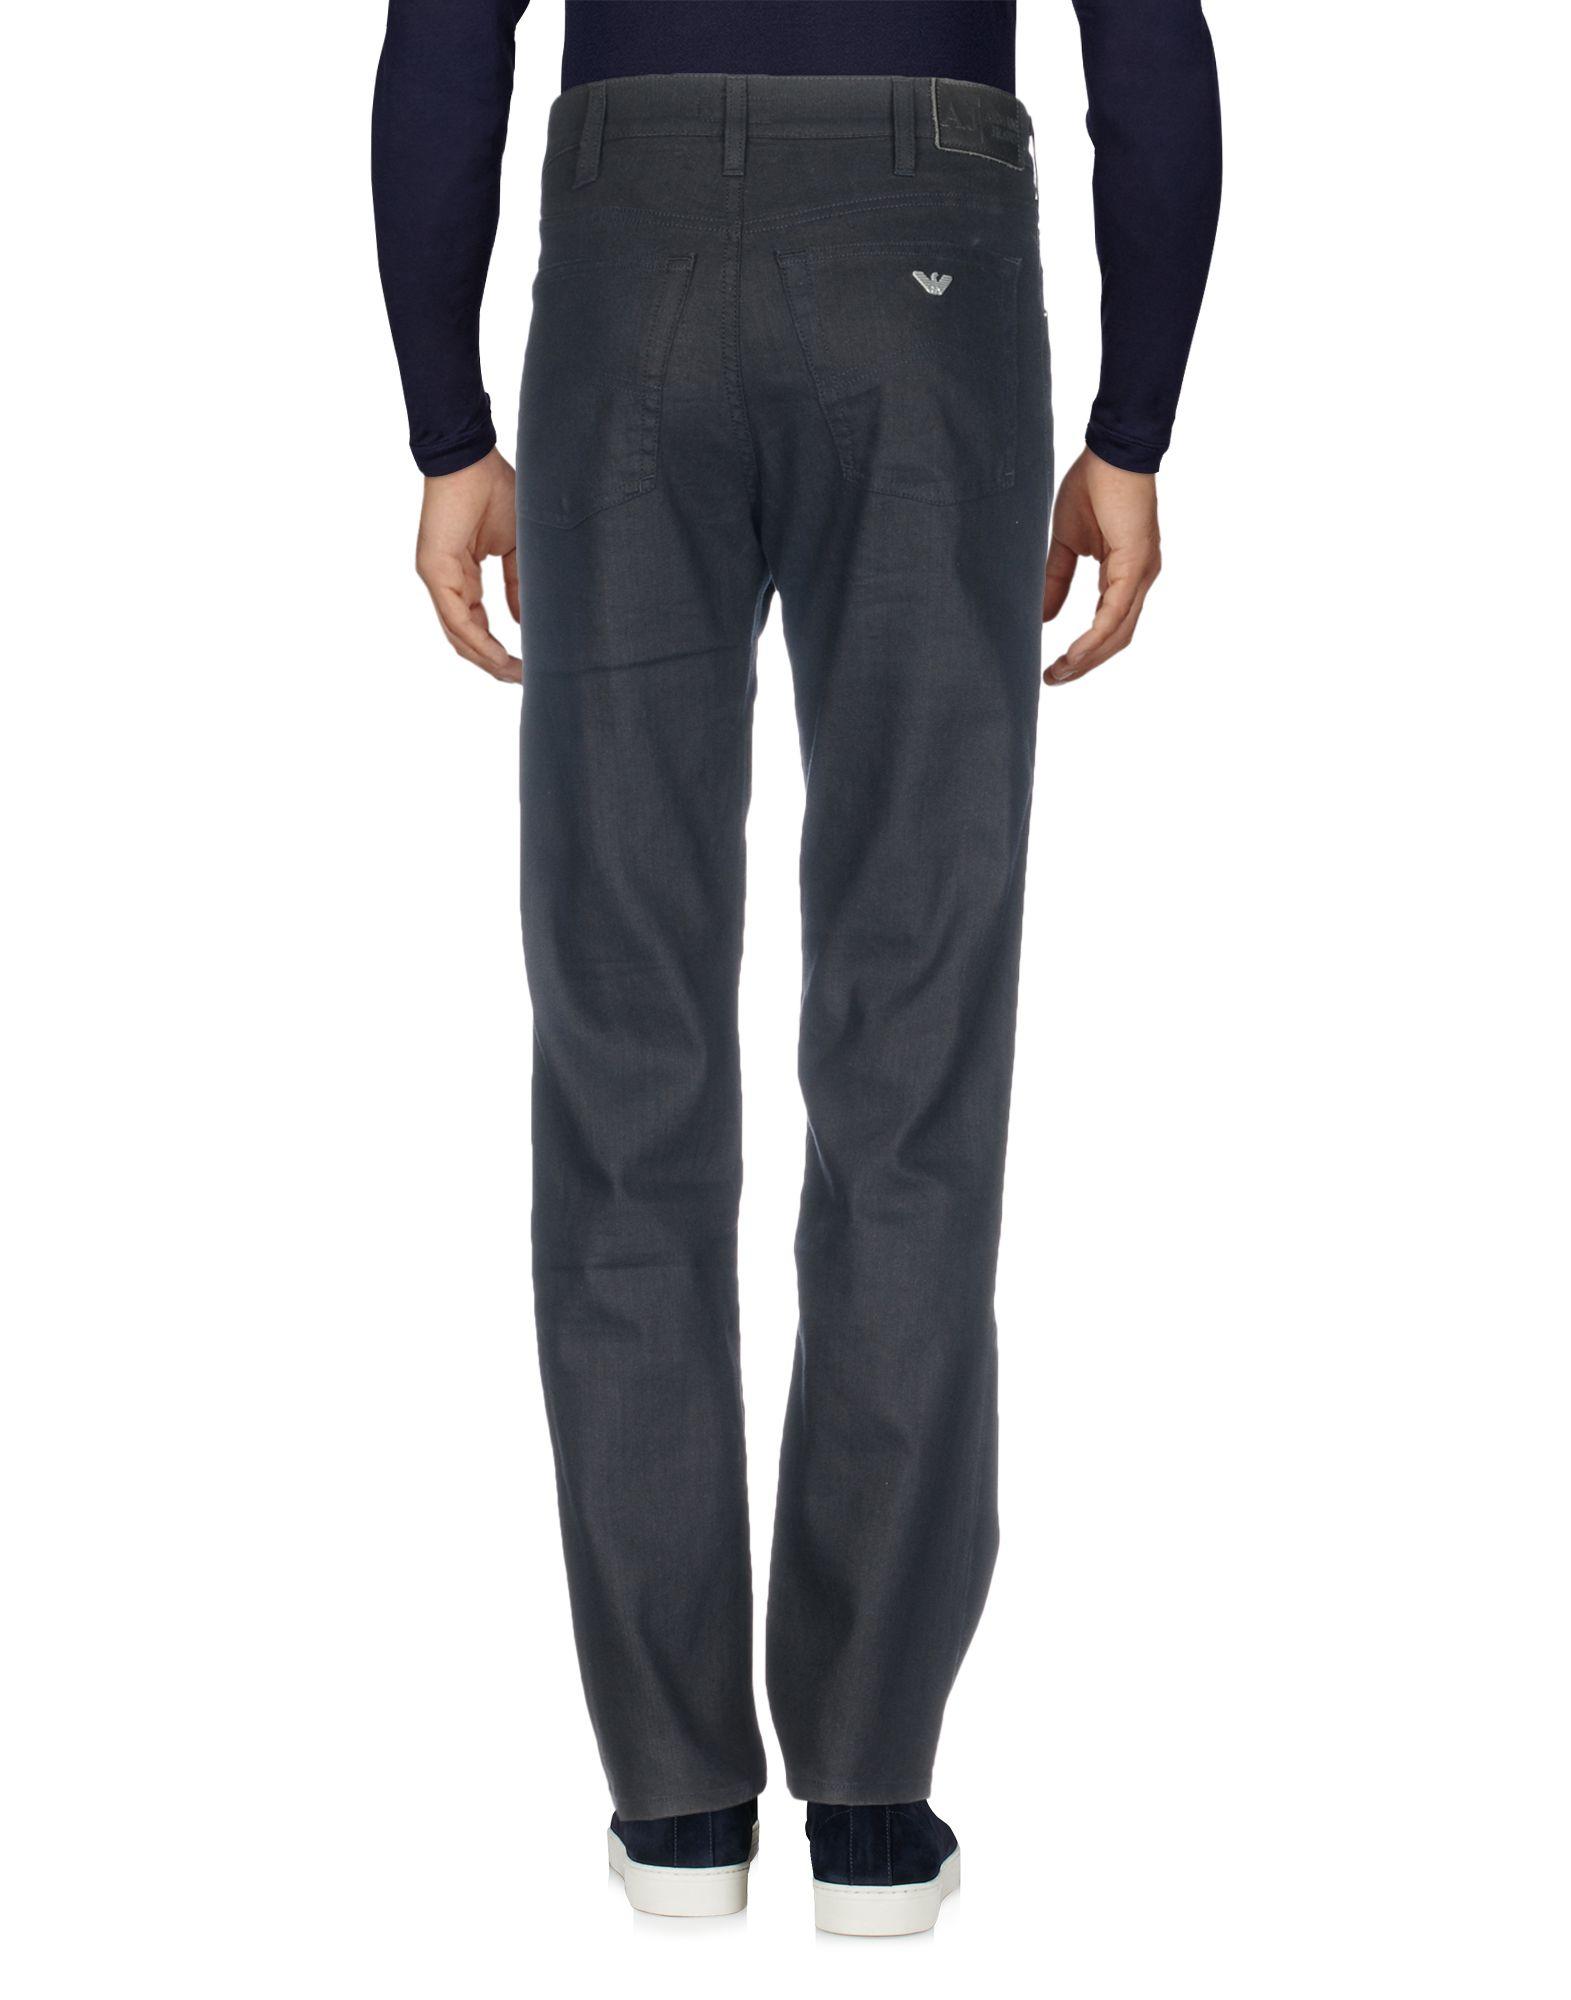 Pantaloni Jeans Armani 42672964DJ Jeans Uomo - 42672964DJ Armani f819c0